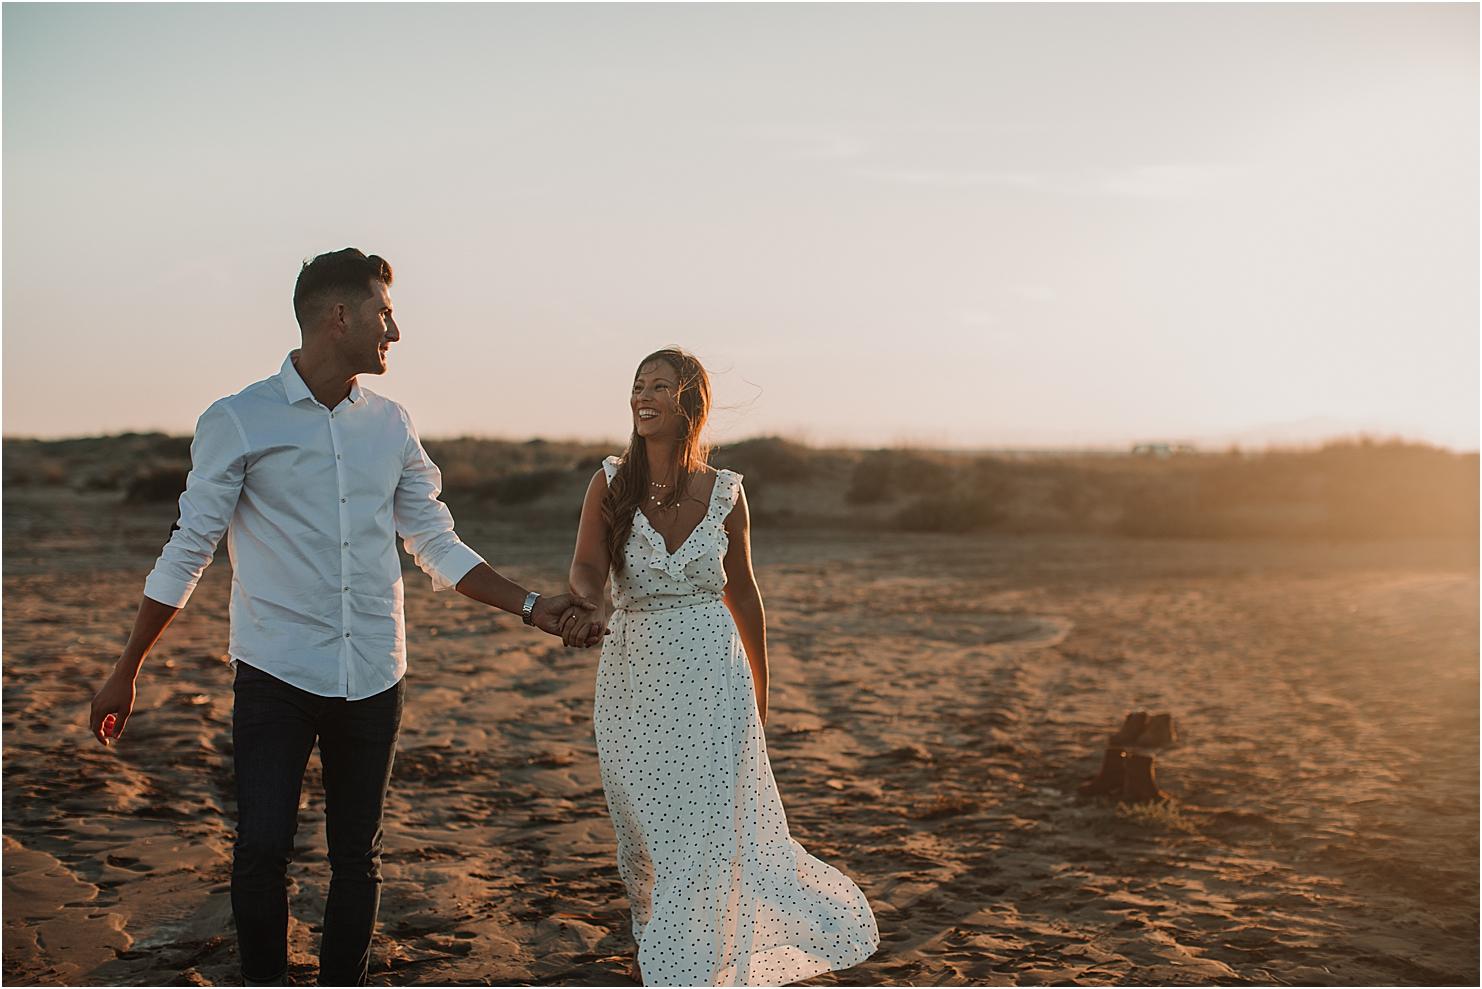 fotografo de boda en tarragona -17.jpg